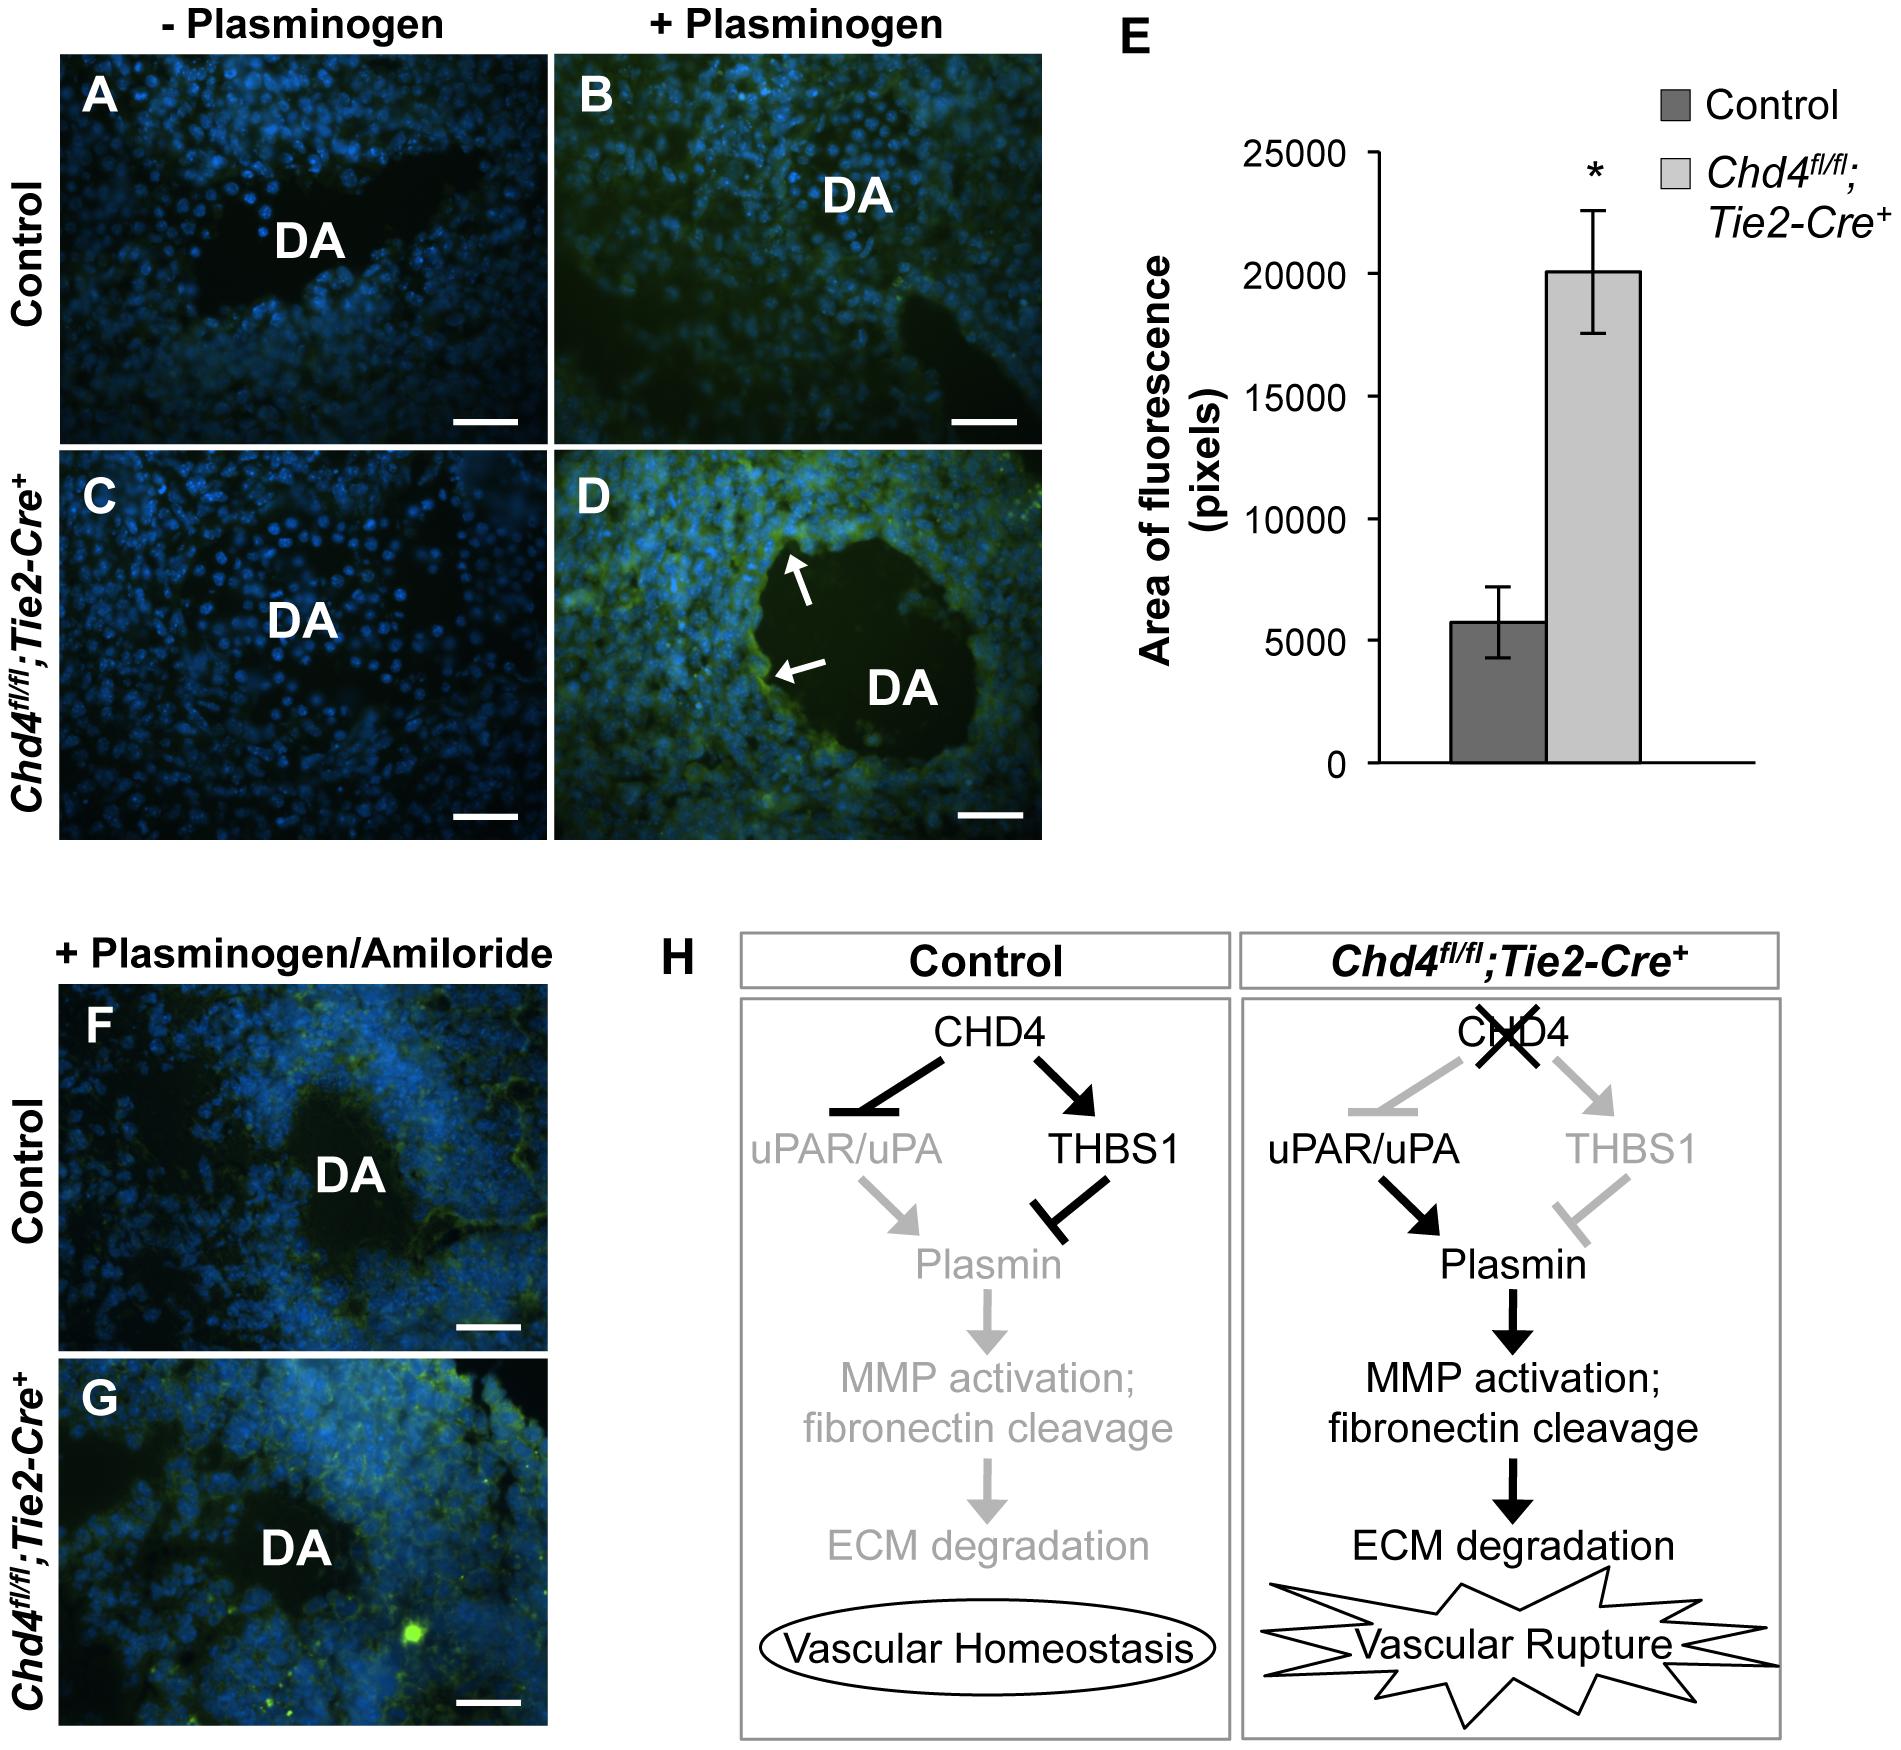 Excessive plasmin activity is detected around rupture-prone <i>Chd4<sup>fl/fl</sup>;Tie2-Cre<sup>+</sup></i> blood vessels.